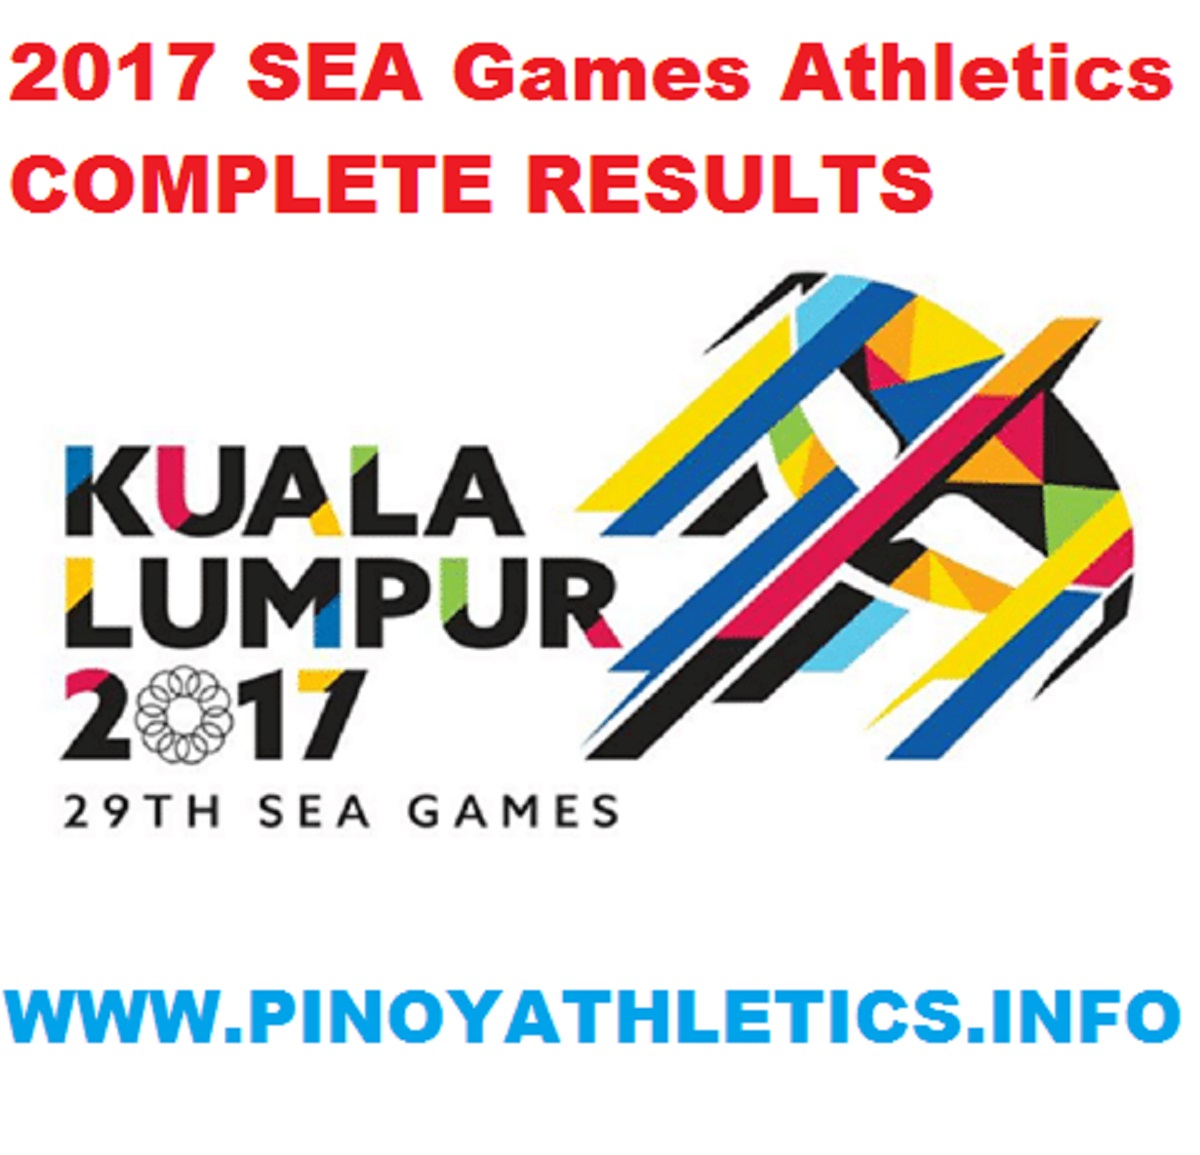 2017 SEA Games Athletics Results 2